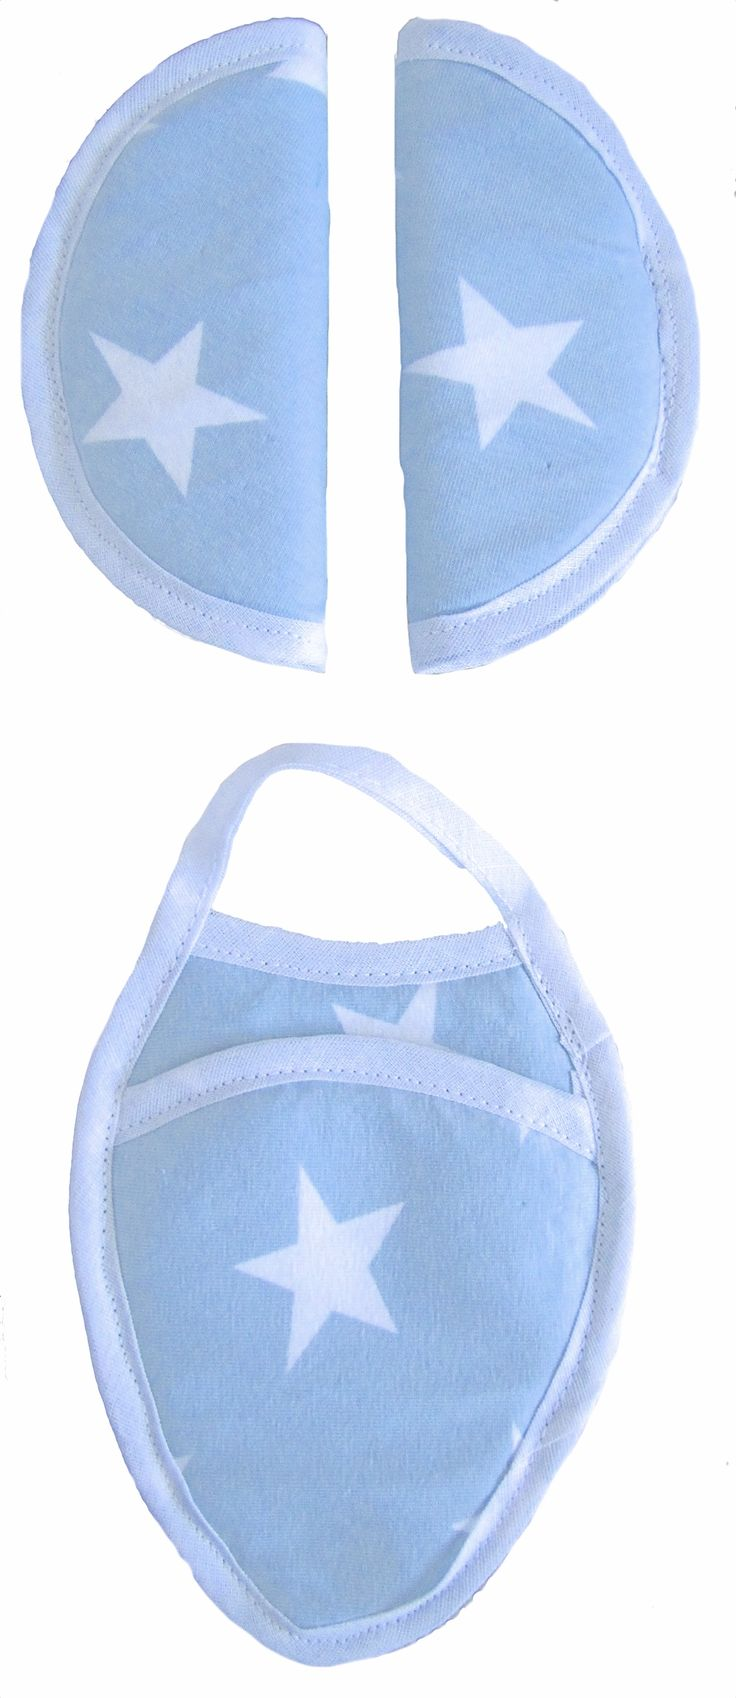 Maxi Cosi gordelbeschermers beltpad Ster Lichtblauw strap cover gurtpolster car seat >> https://www.stoelsprookjes.nl/c-3077820/gordelbeschermers/